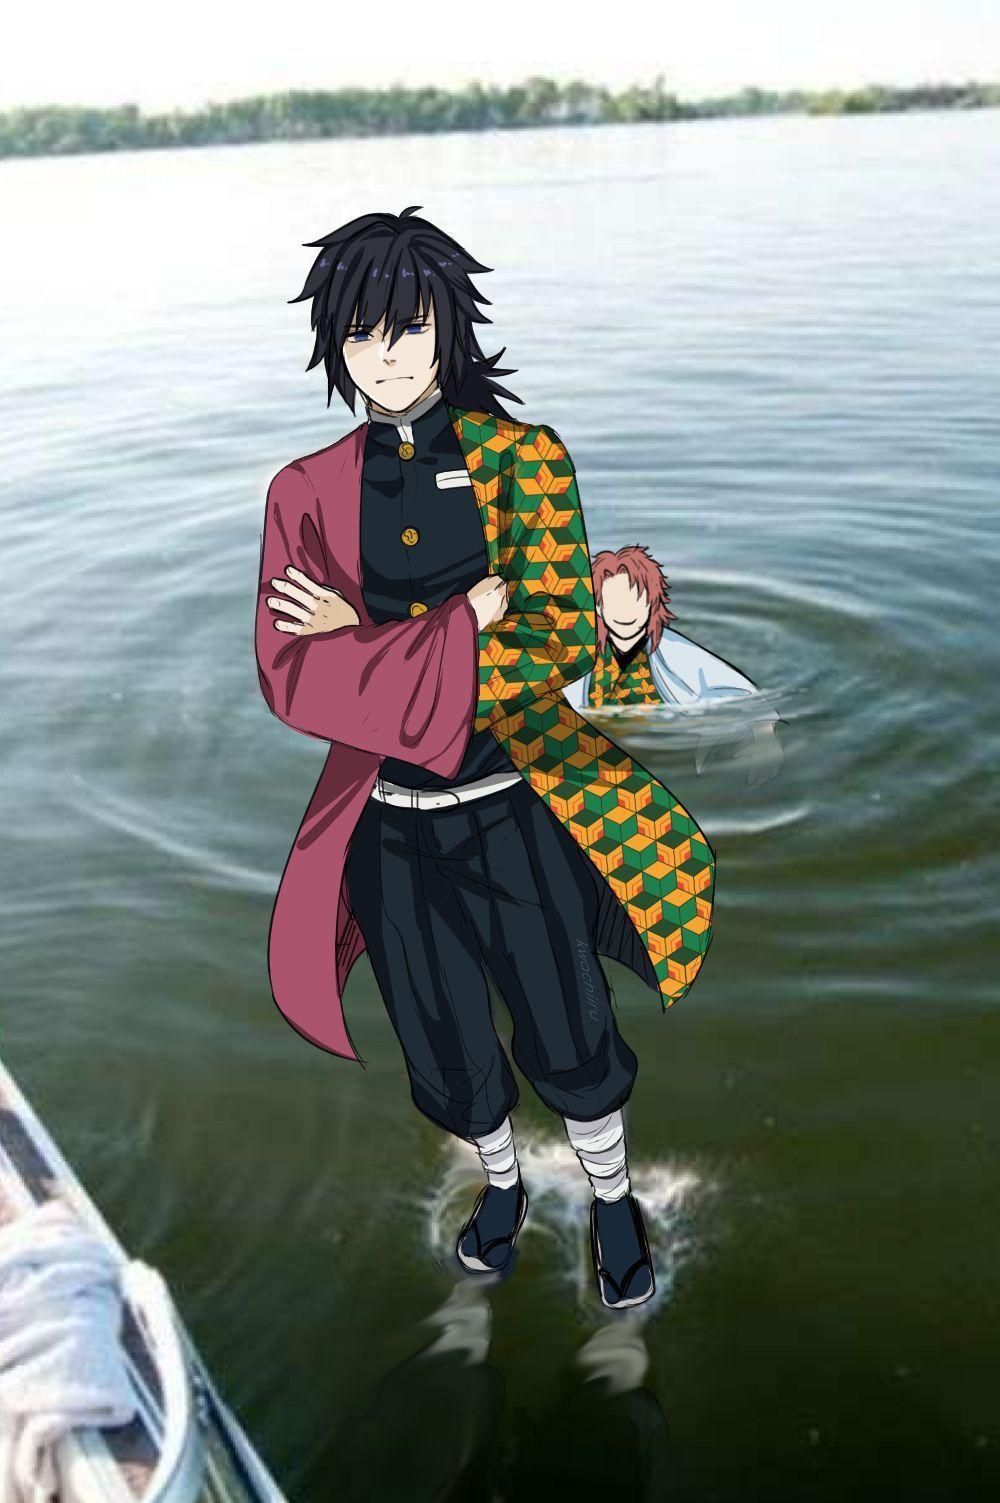 Comics kny 2 anime demon funny anime pics slayer meme